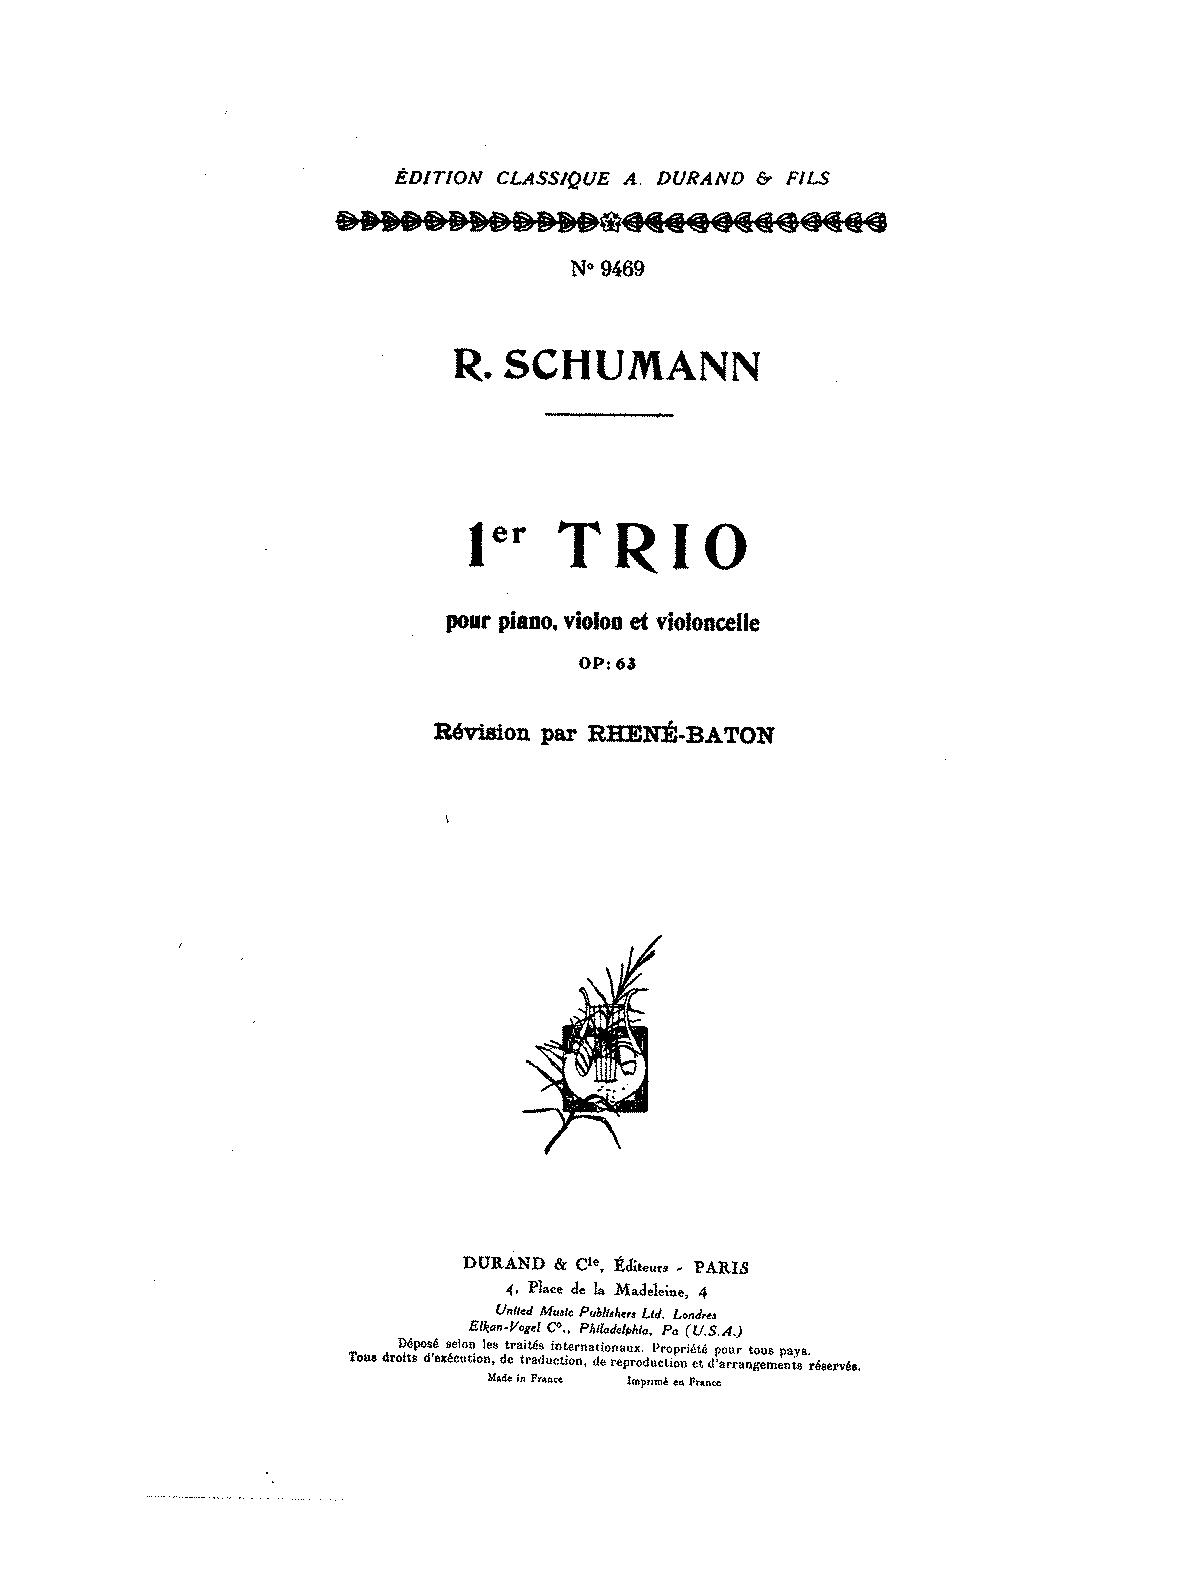 Piano trio no1 op63 schumann robert imslppetrucci music piano trio no1 op63 schumann robert imslppetrucci music library free public domain sheet music hexwebz Images